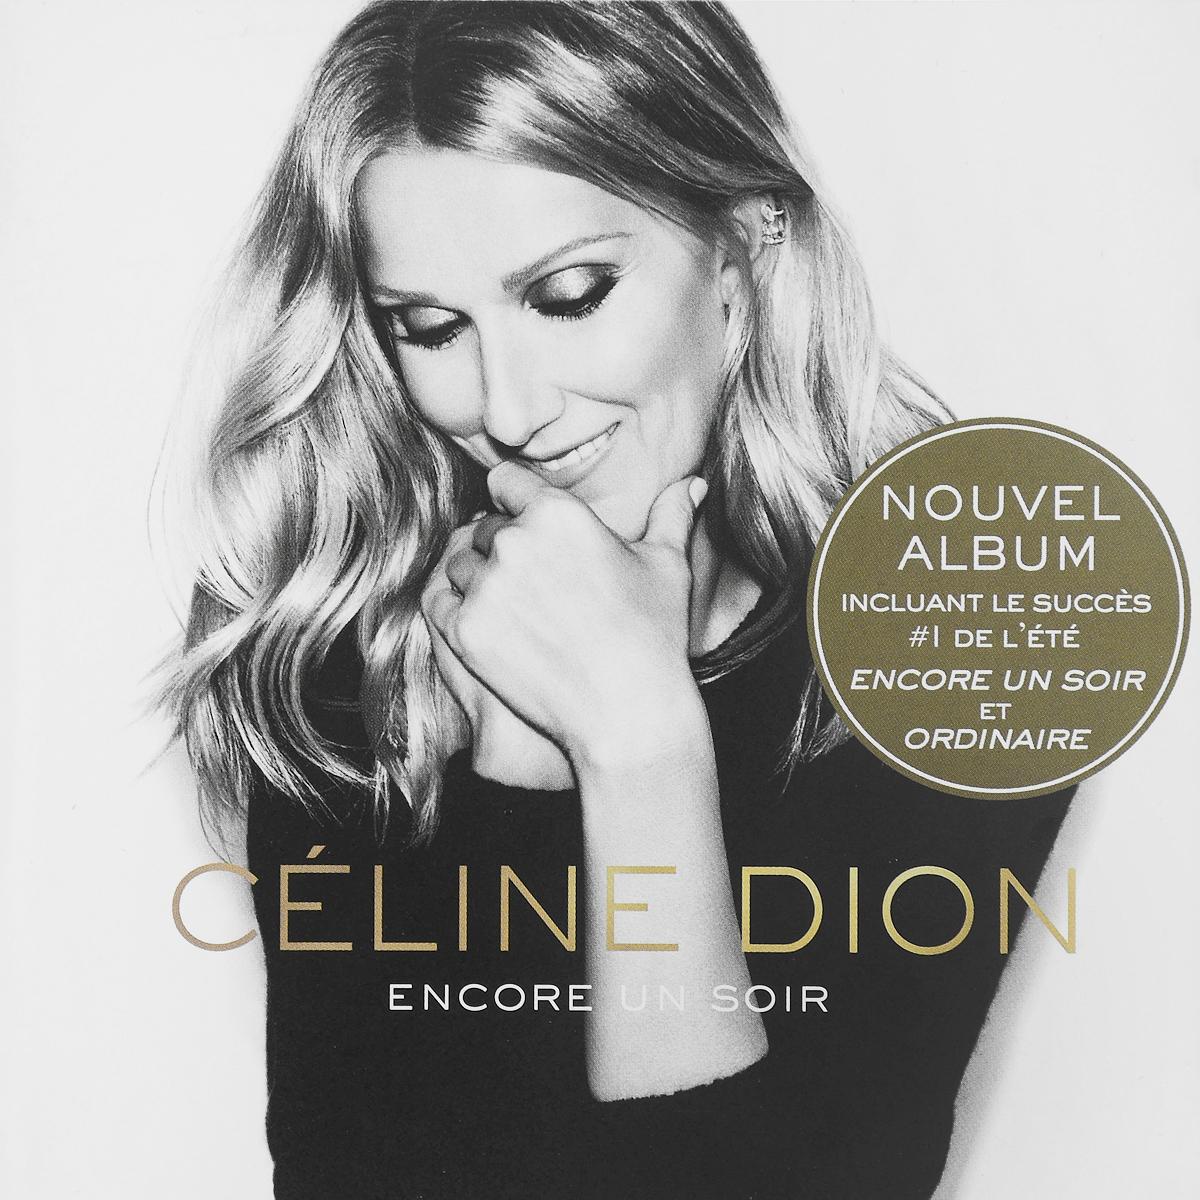 Селин Дион Celine Dion. Encore Un Soir сумку селин нано в минске